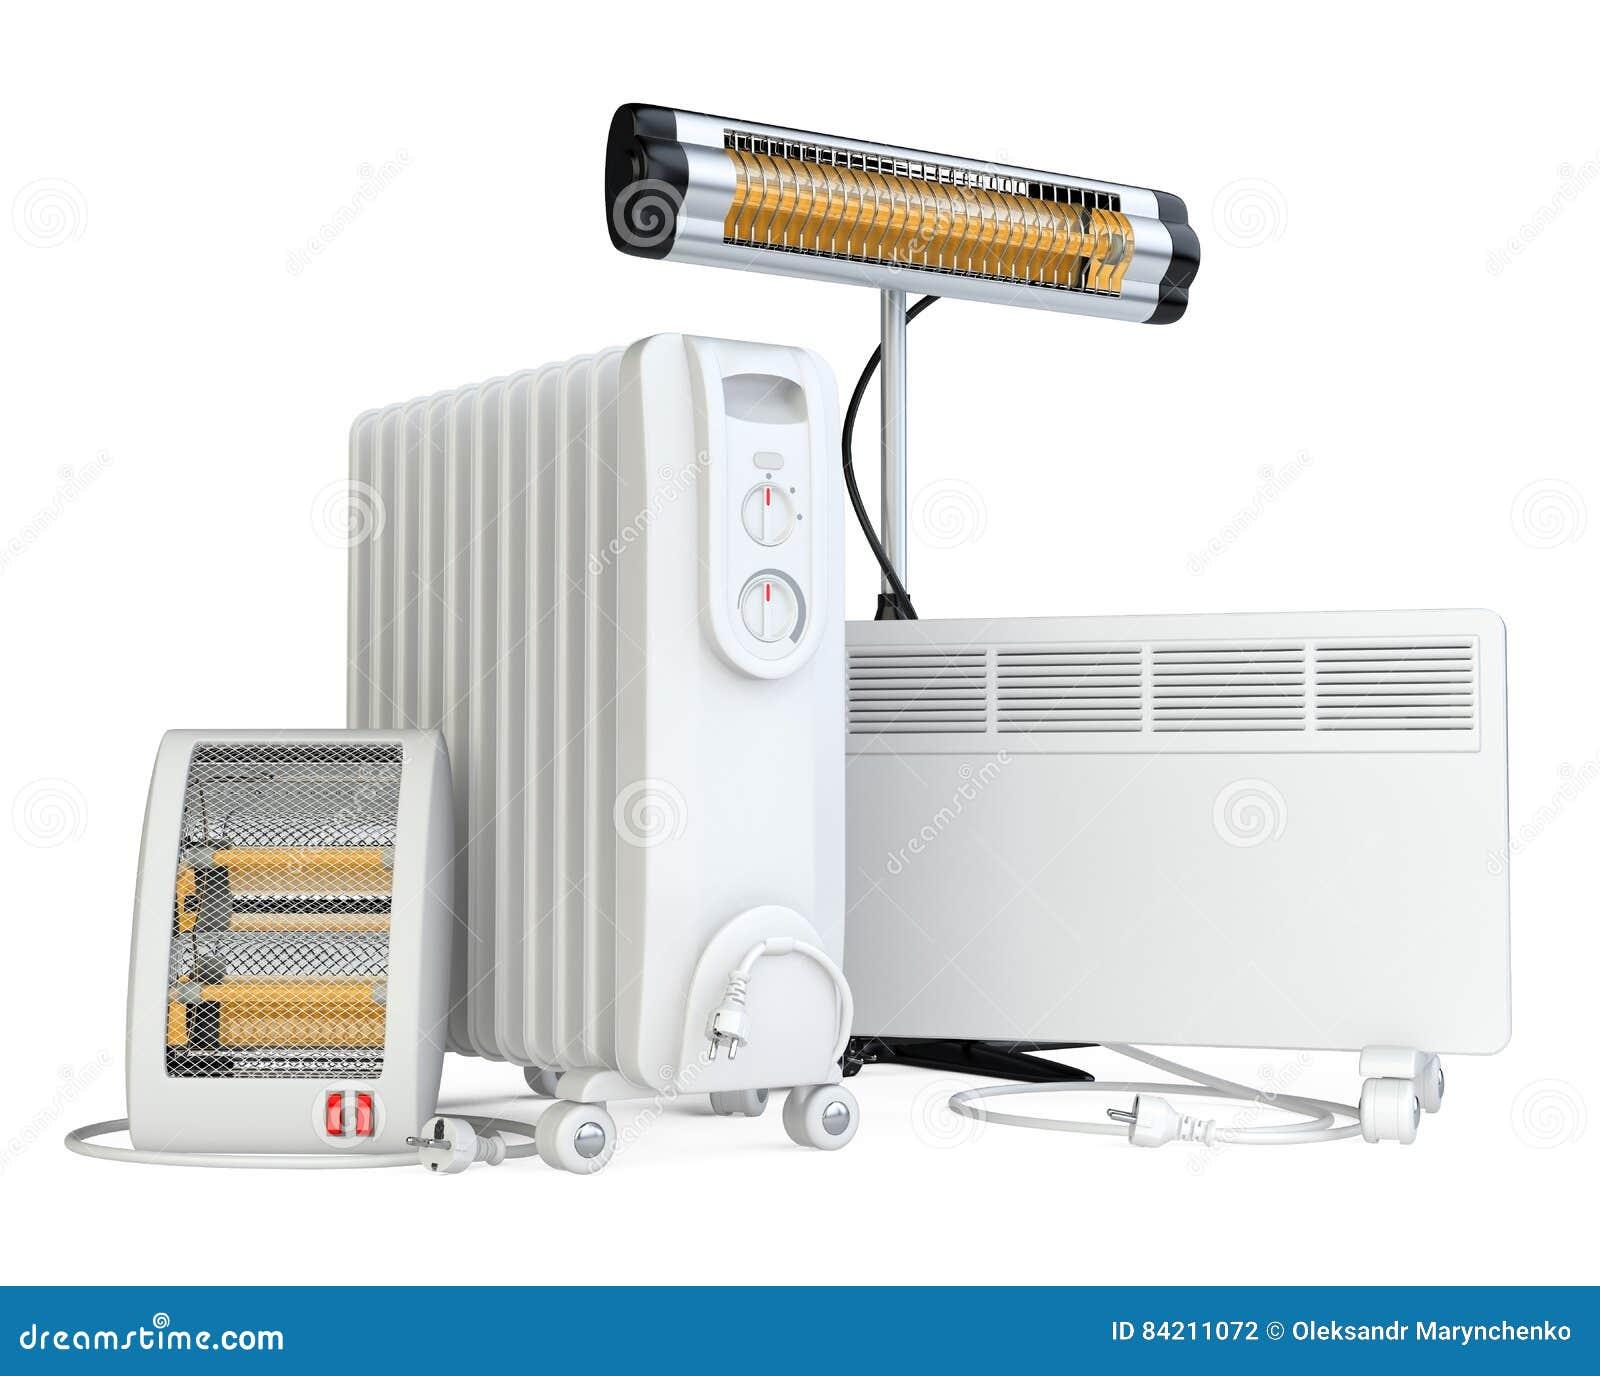 Huismateriaal om te verwarmen, halogeen, infrarood van kwartsverwarmer